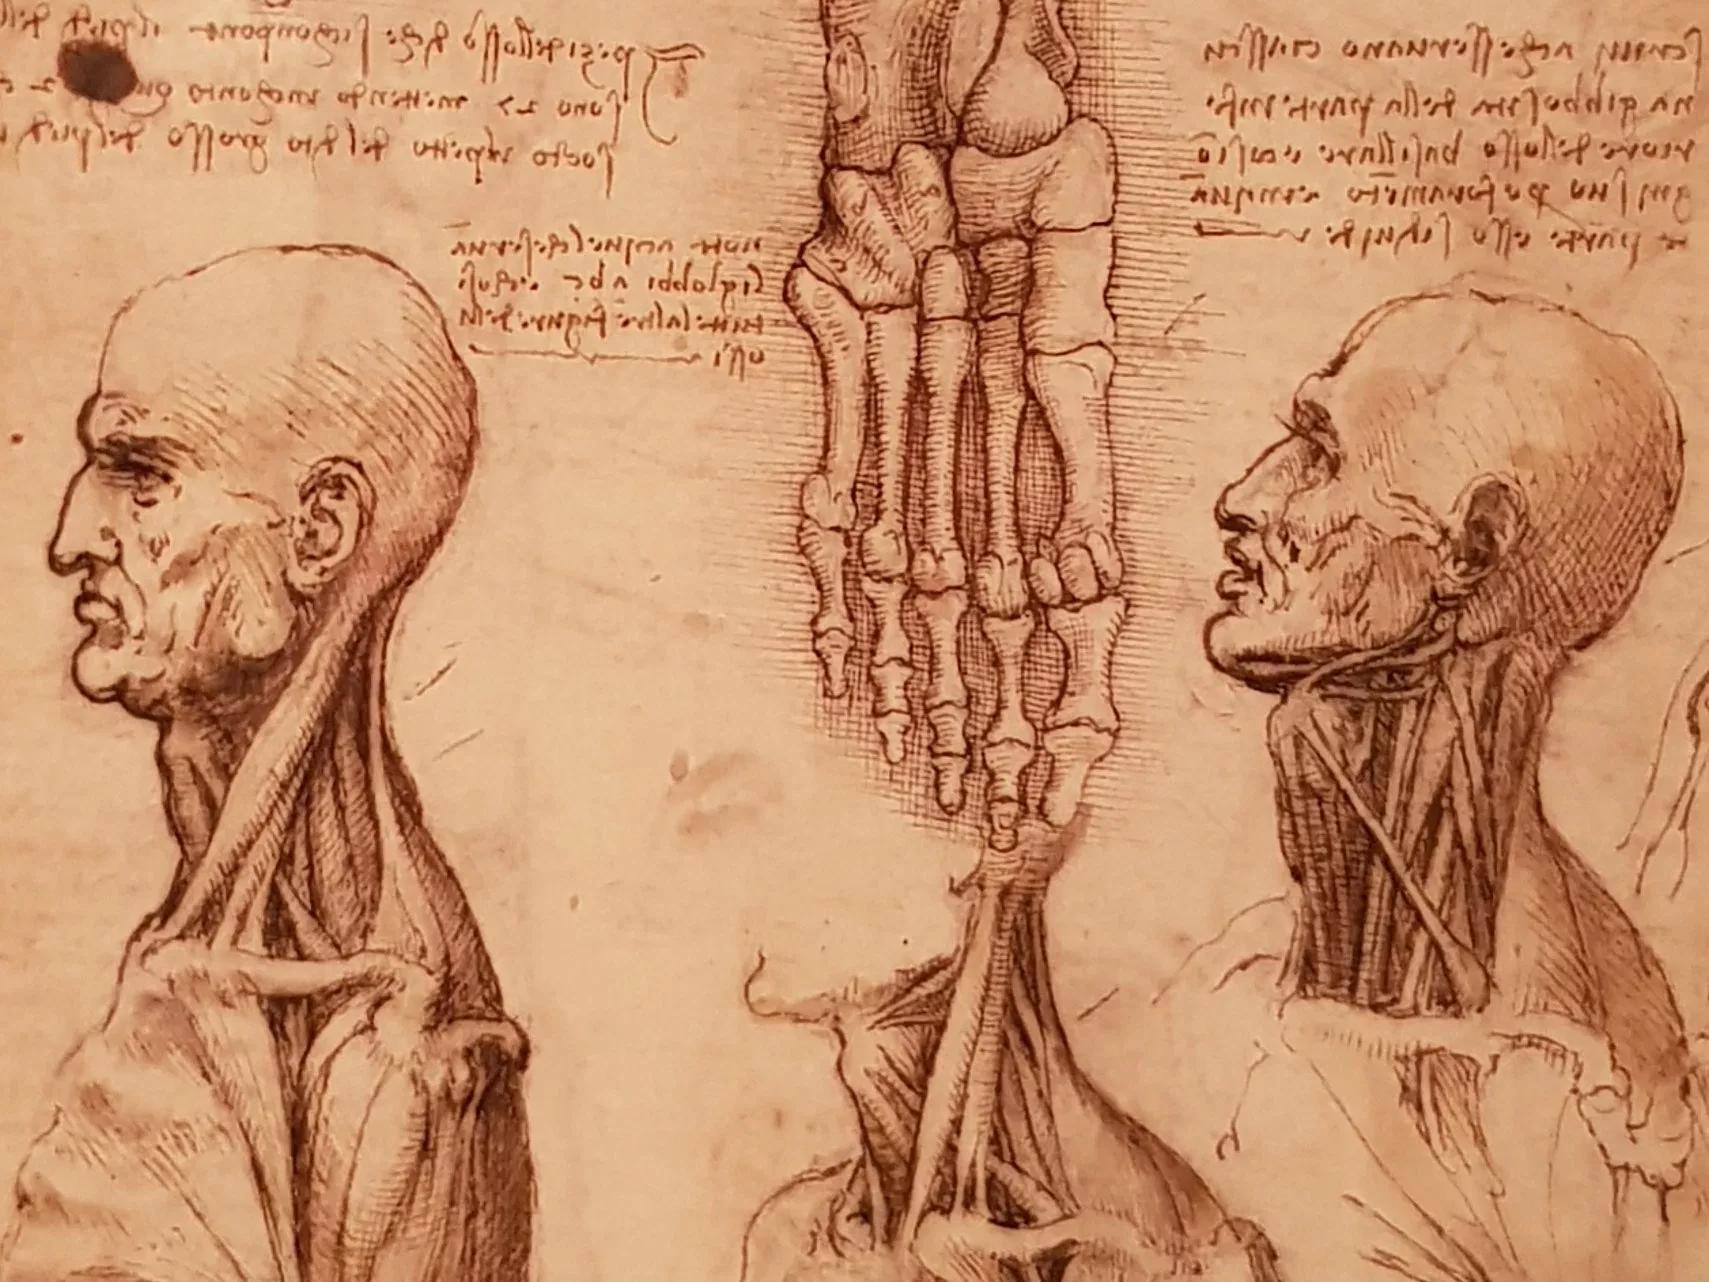 Leonardo's anatomical drawing